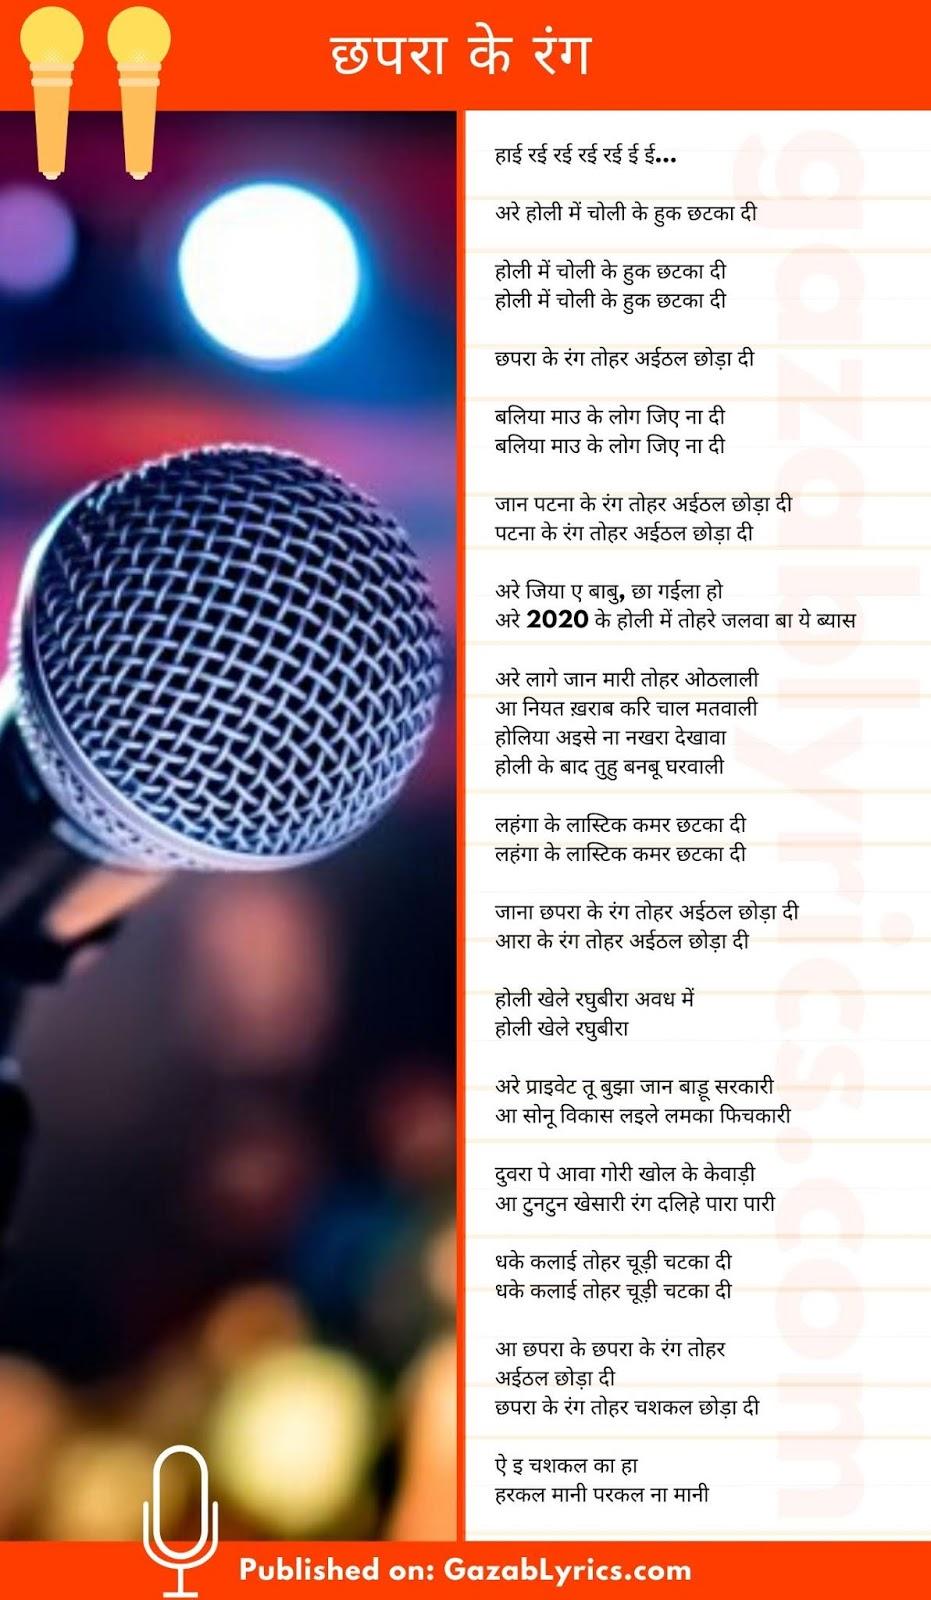 Chhapra Ke Rang song lyrics image